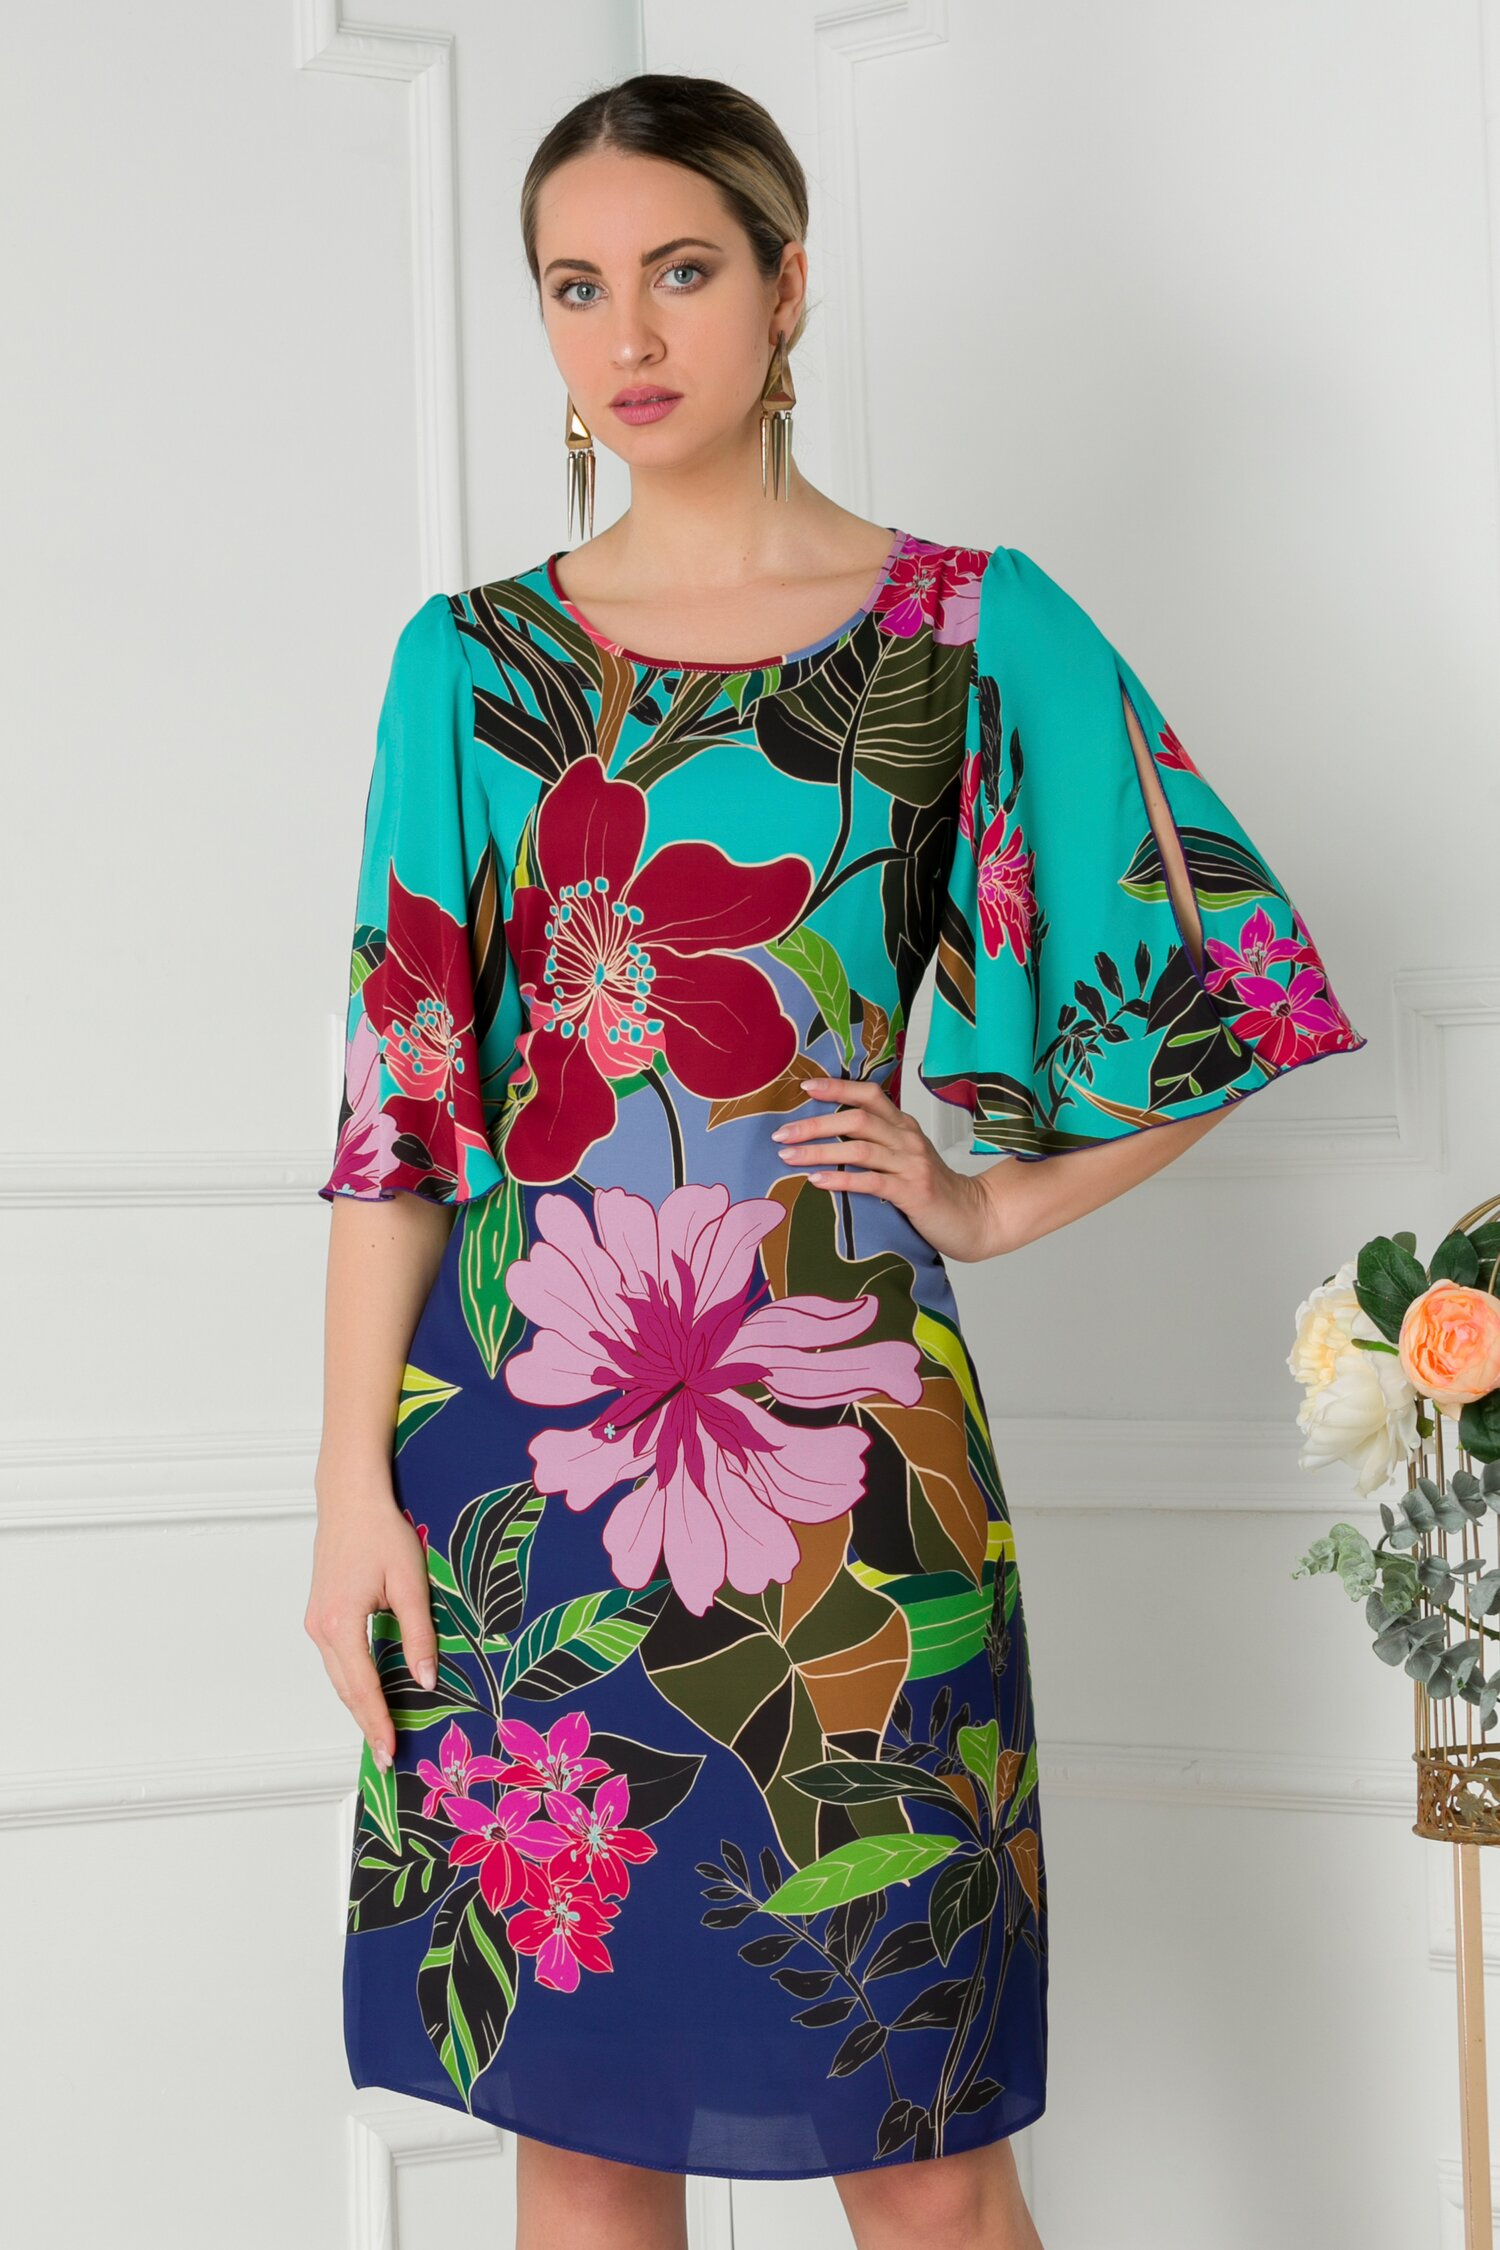 Rochie Mara turcoaz vaporoasa cu imprimeu floral maxi